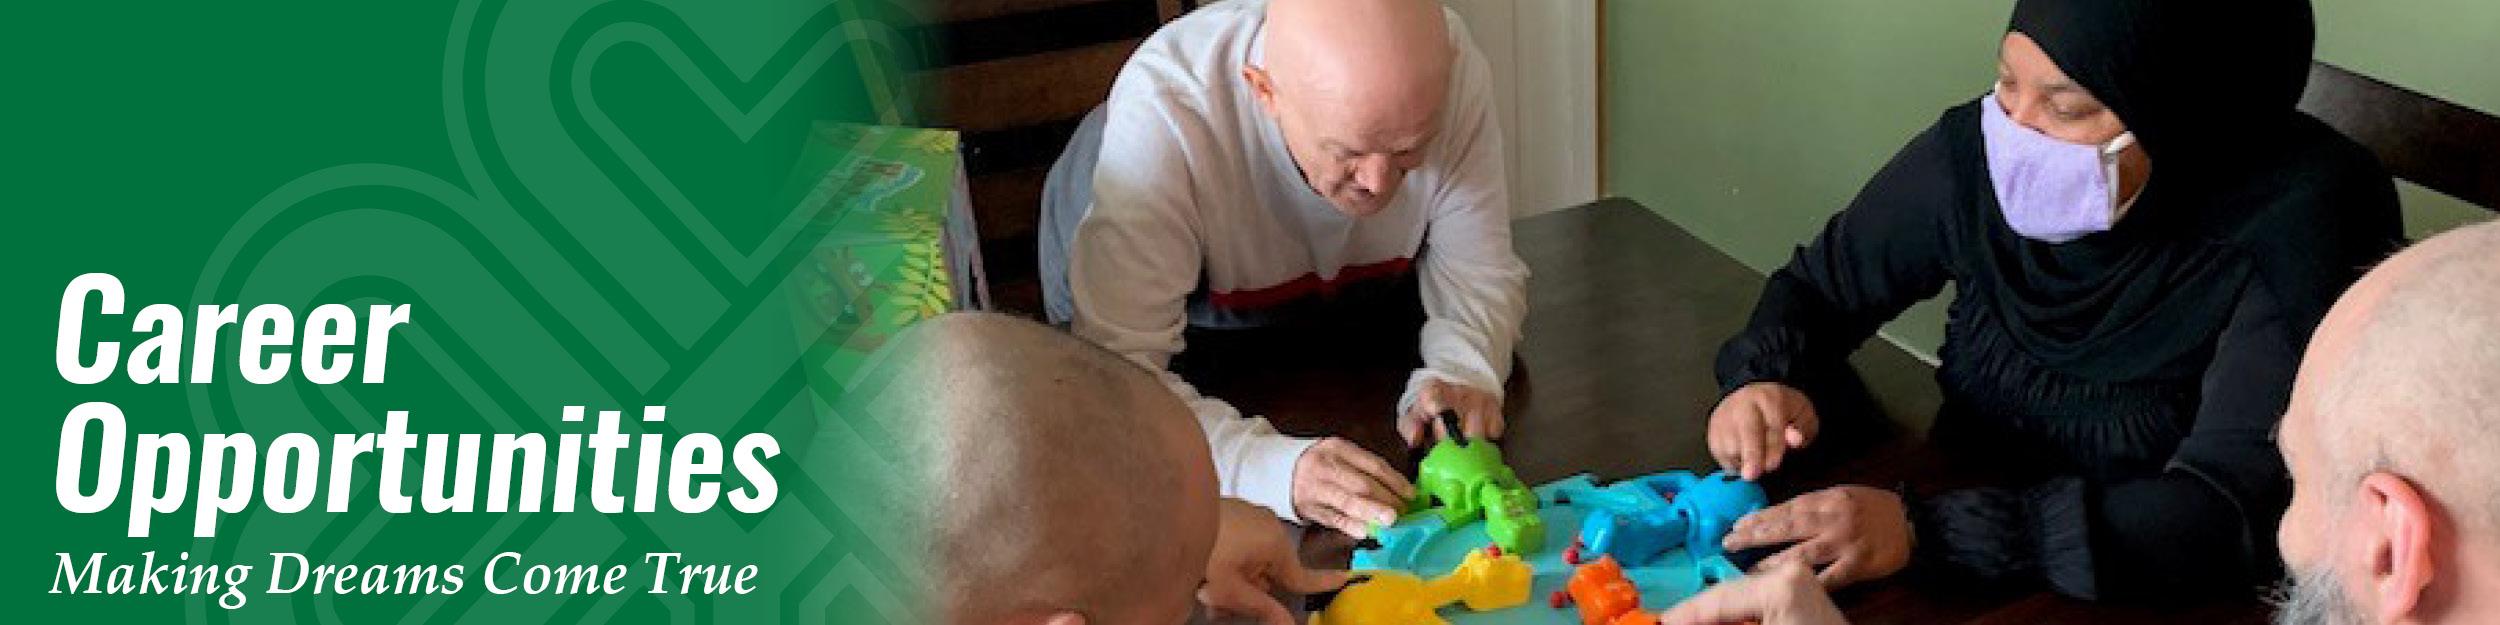 Careers in Philadelphia at Barber National Insitute